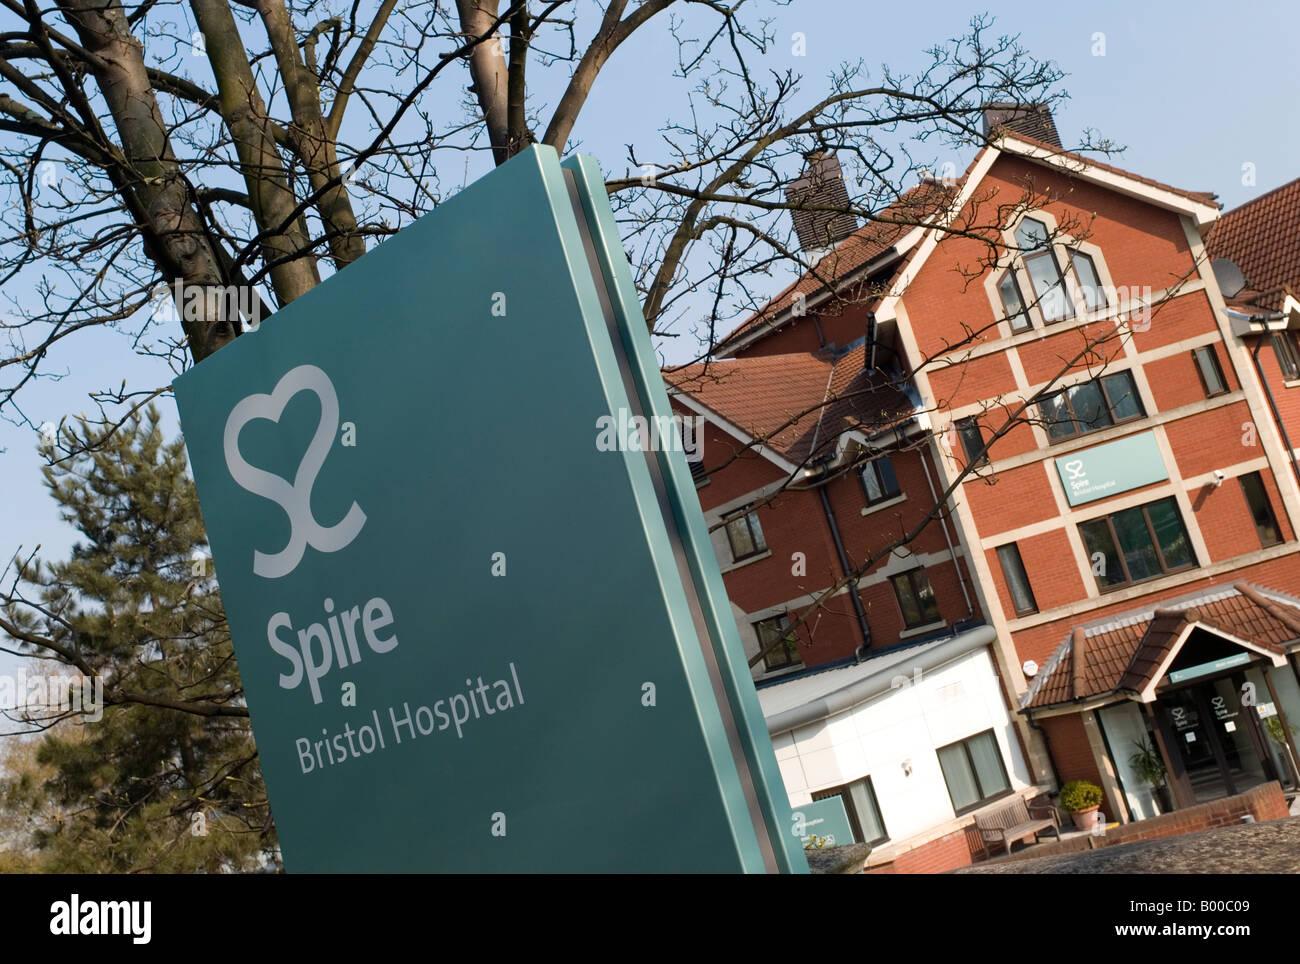 Spire Healthcare  Hospital - Stock Image